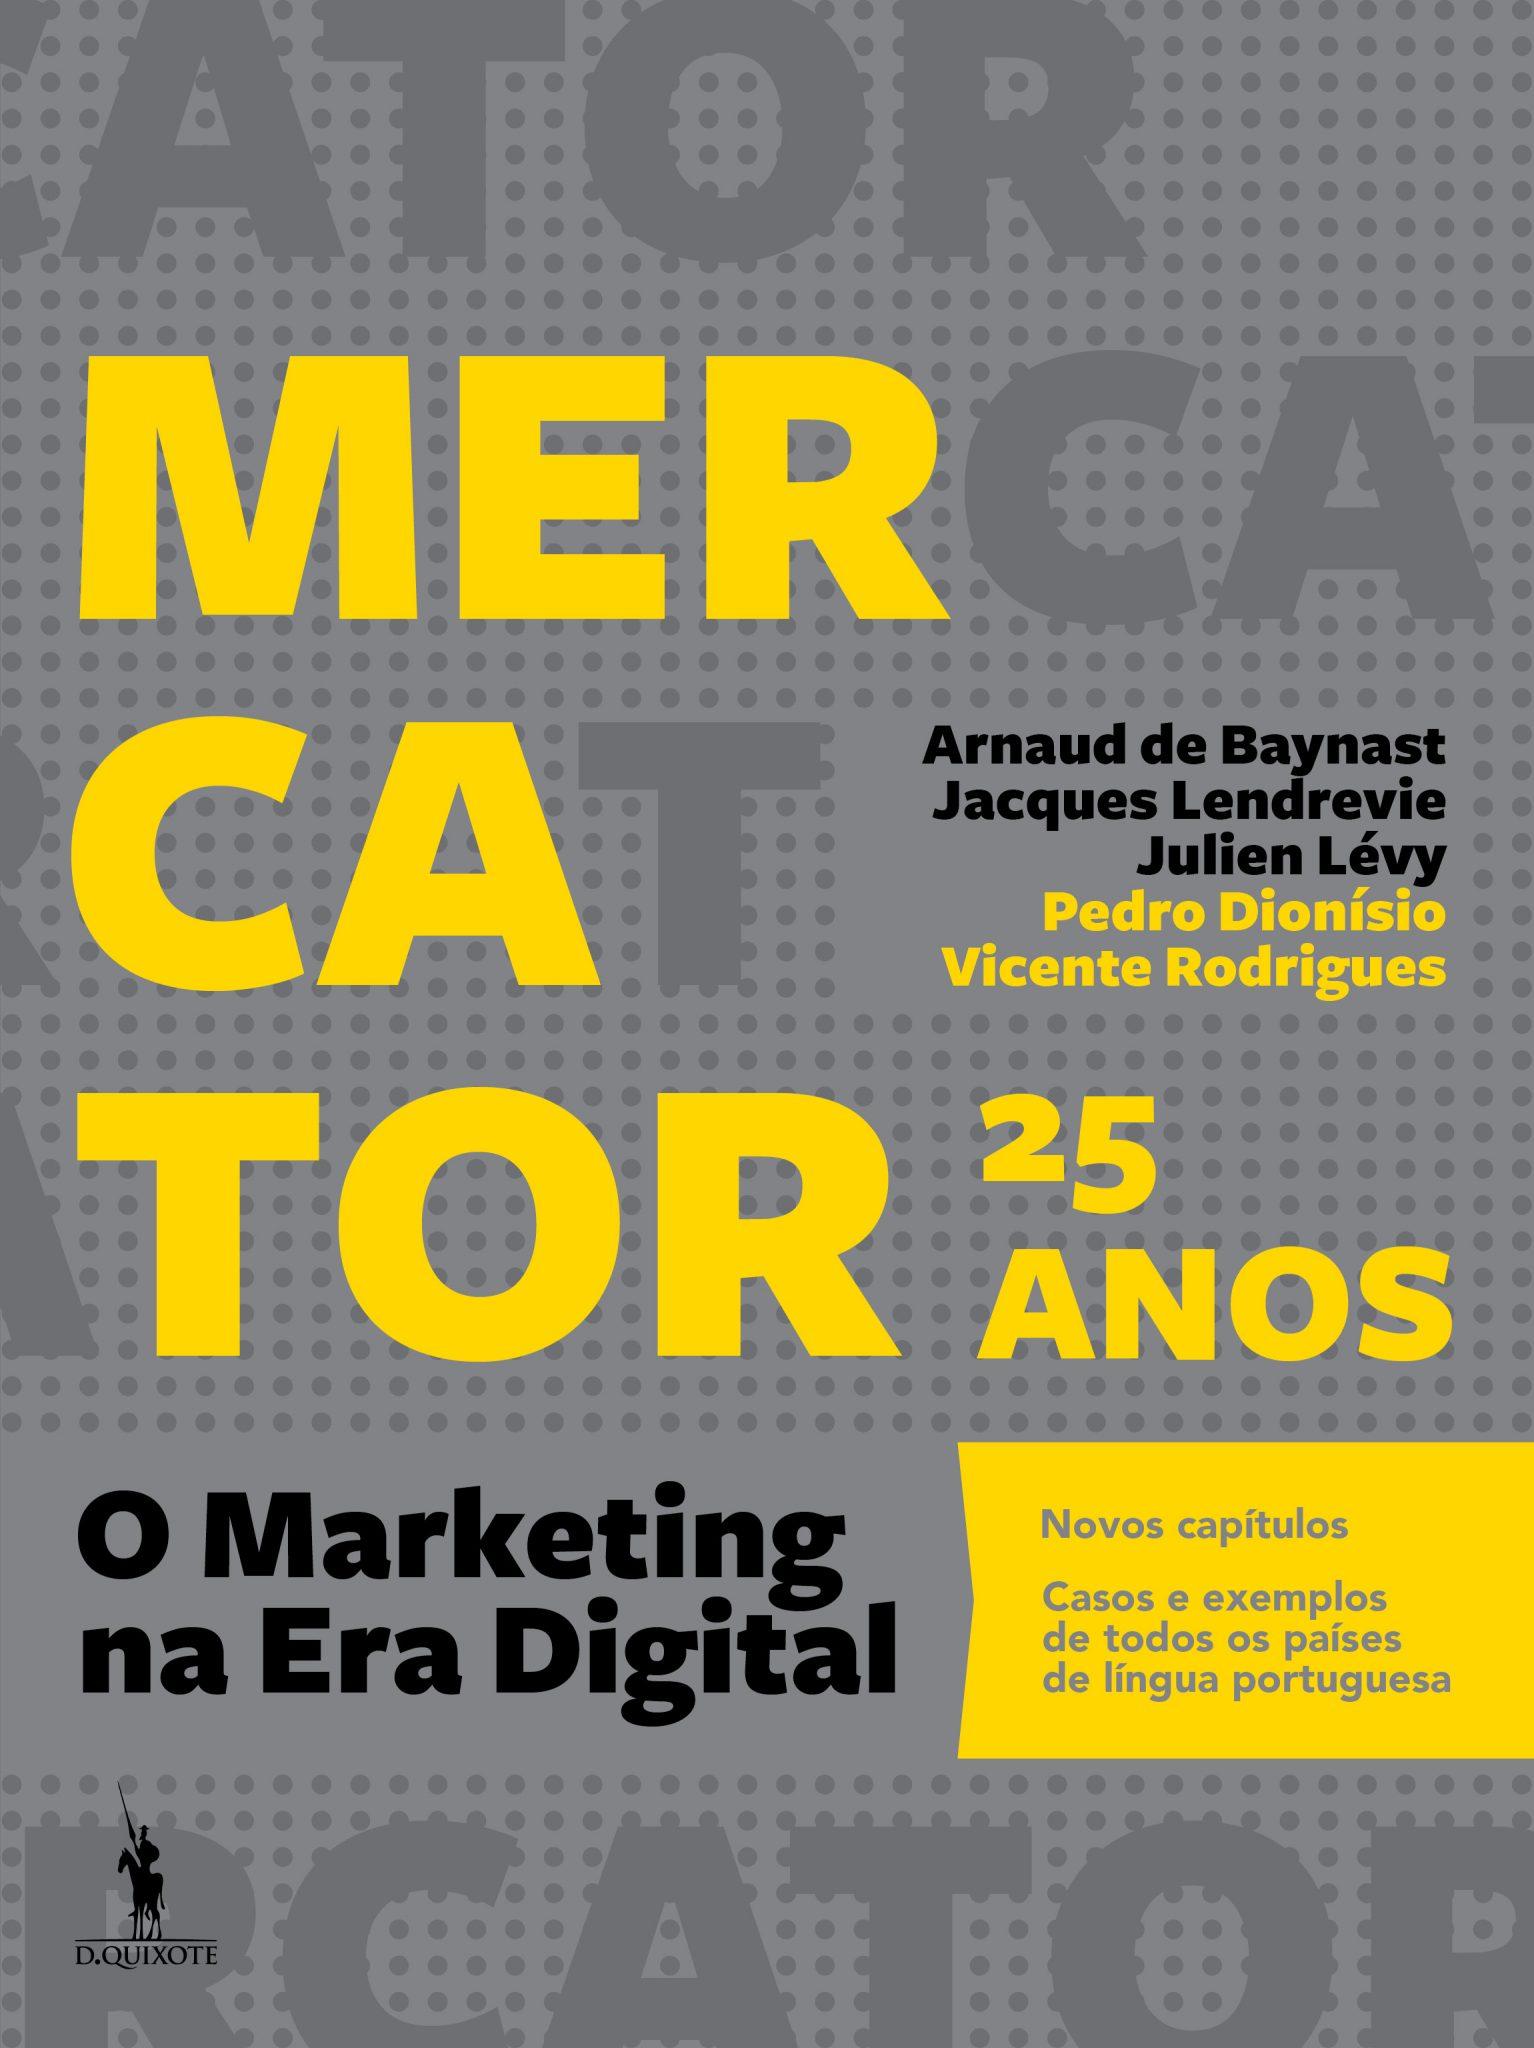 Capa Livro Mercator